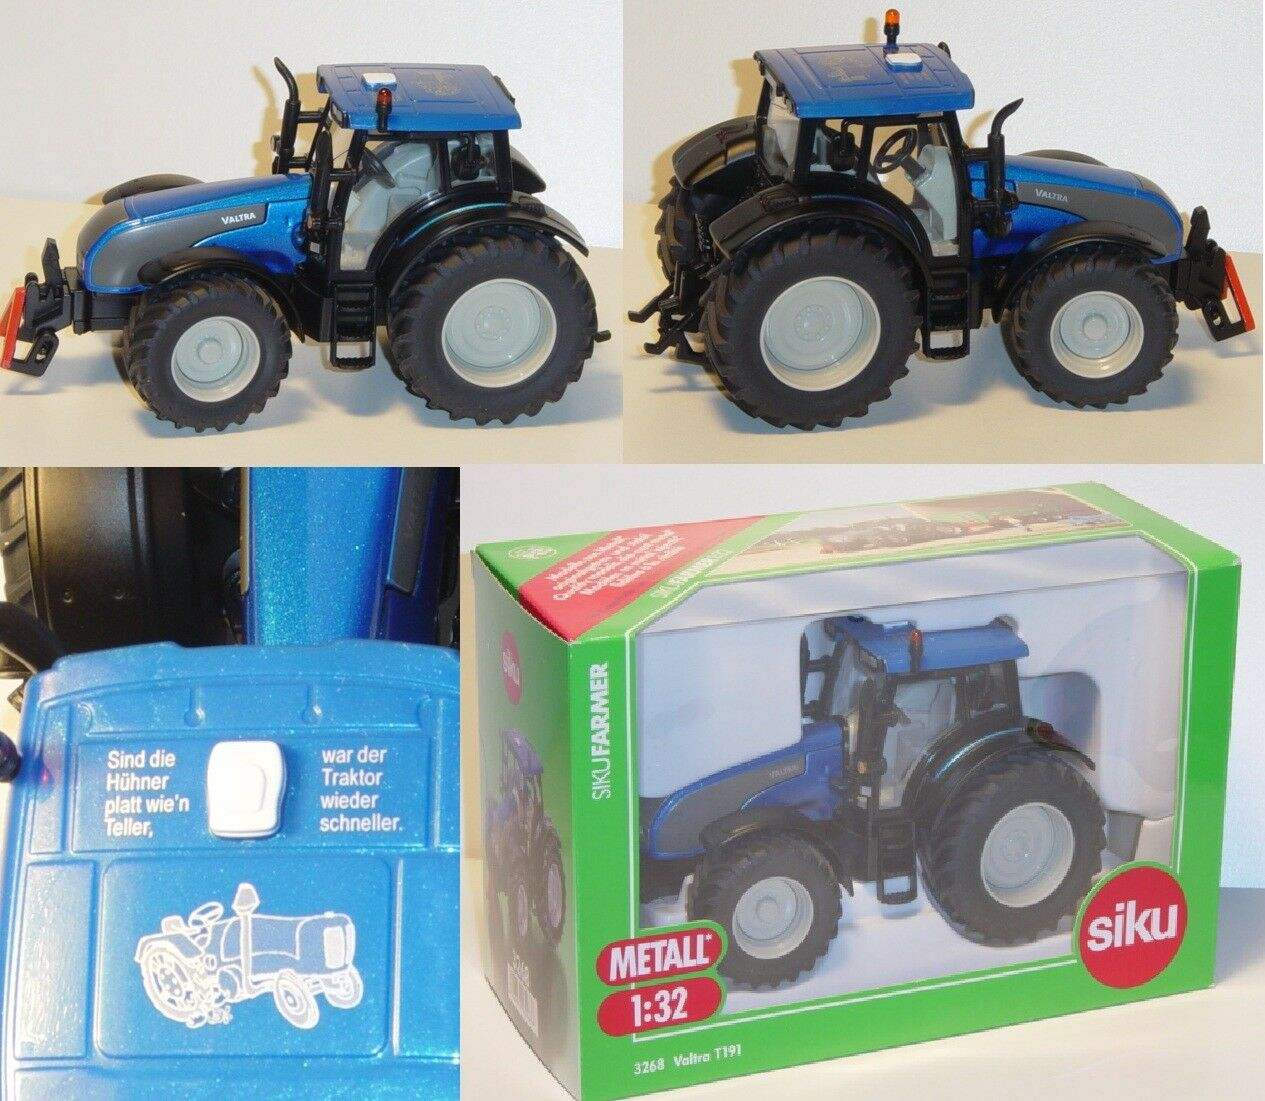 Siku Farmer 3268 SSC Valtra  t191 Tractor SSC Special Model 1 32 OVP  grande remise